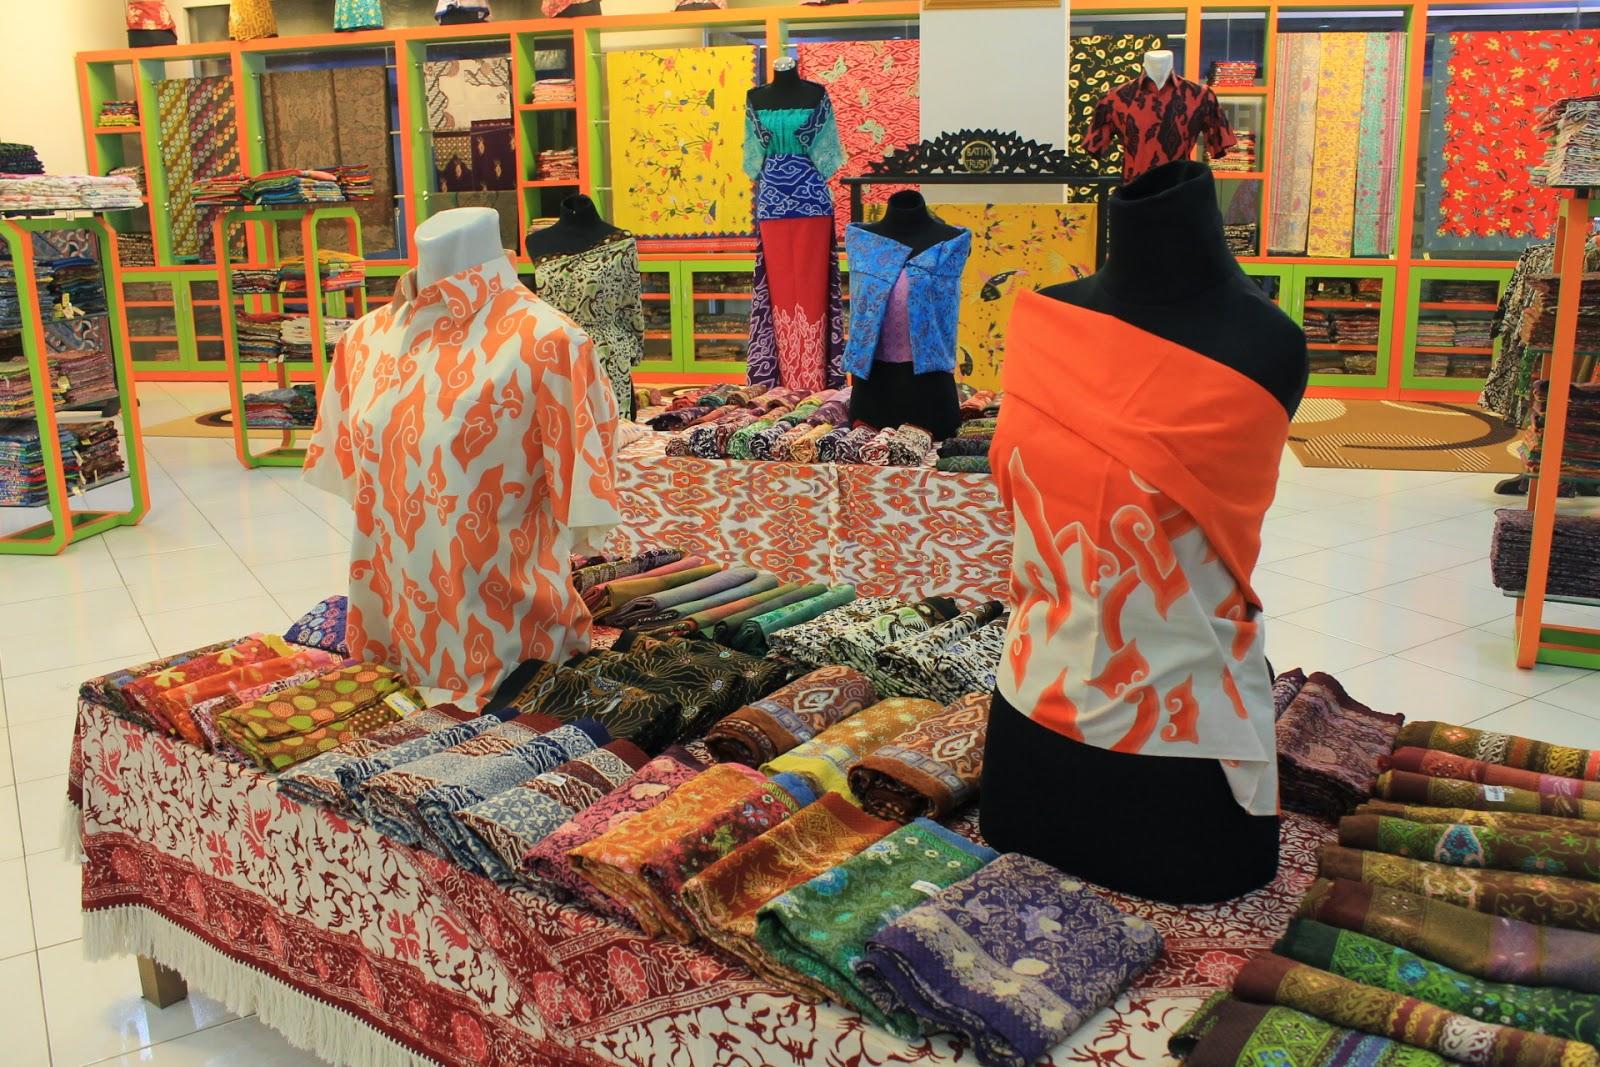 Pusat Grosir Pakaian Batik Jatinegara